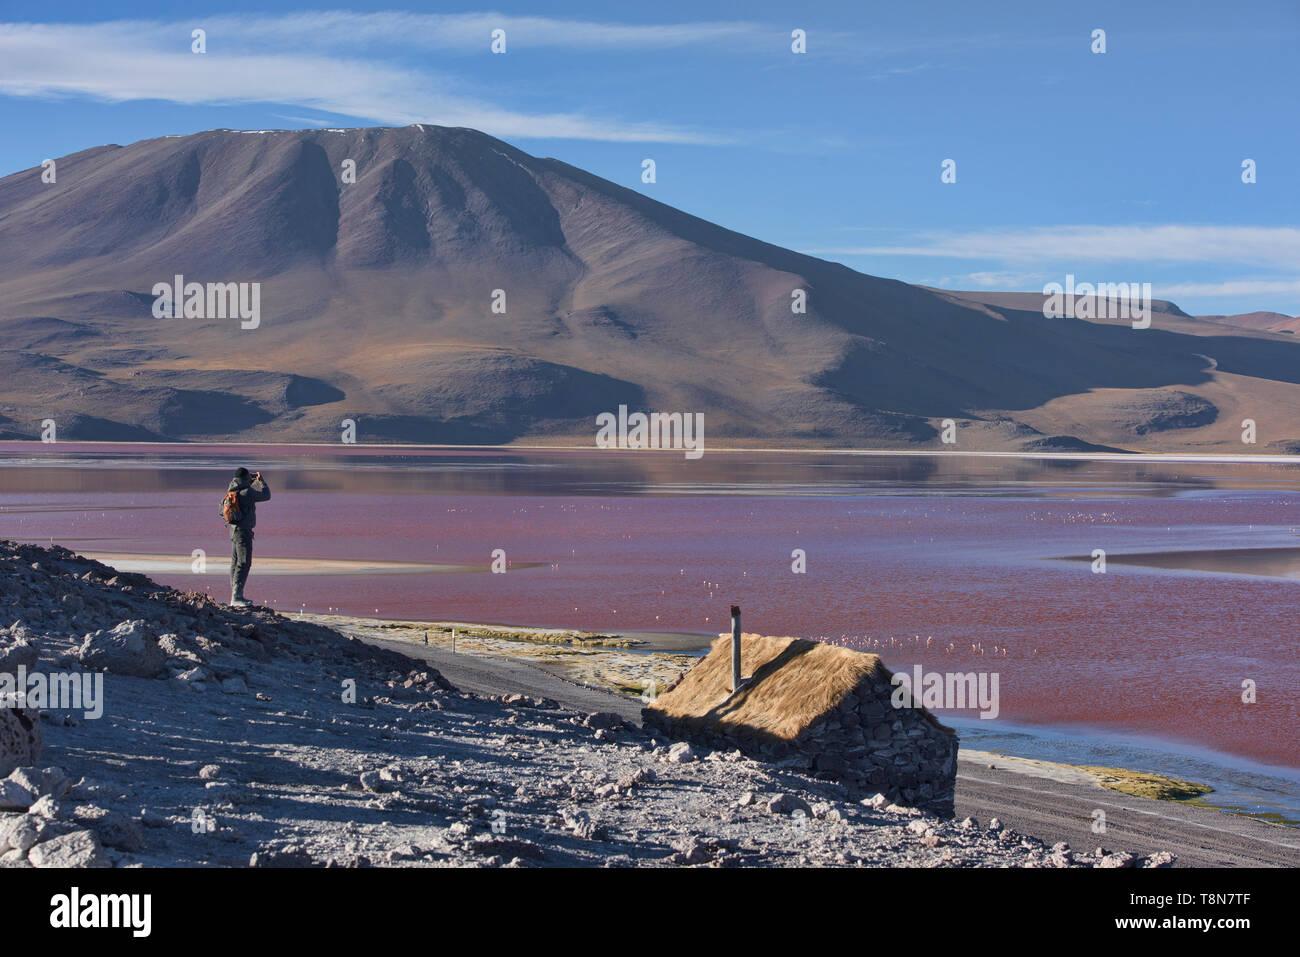 A flamboyance of James's, Andean, and Chilean flamingos on Laguna Colorada, Salar de Uyuni, Bolivia Stock Photo